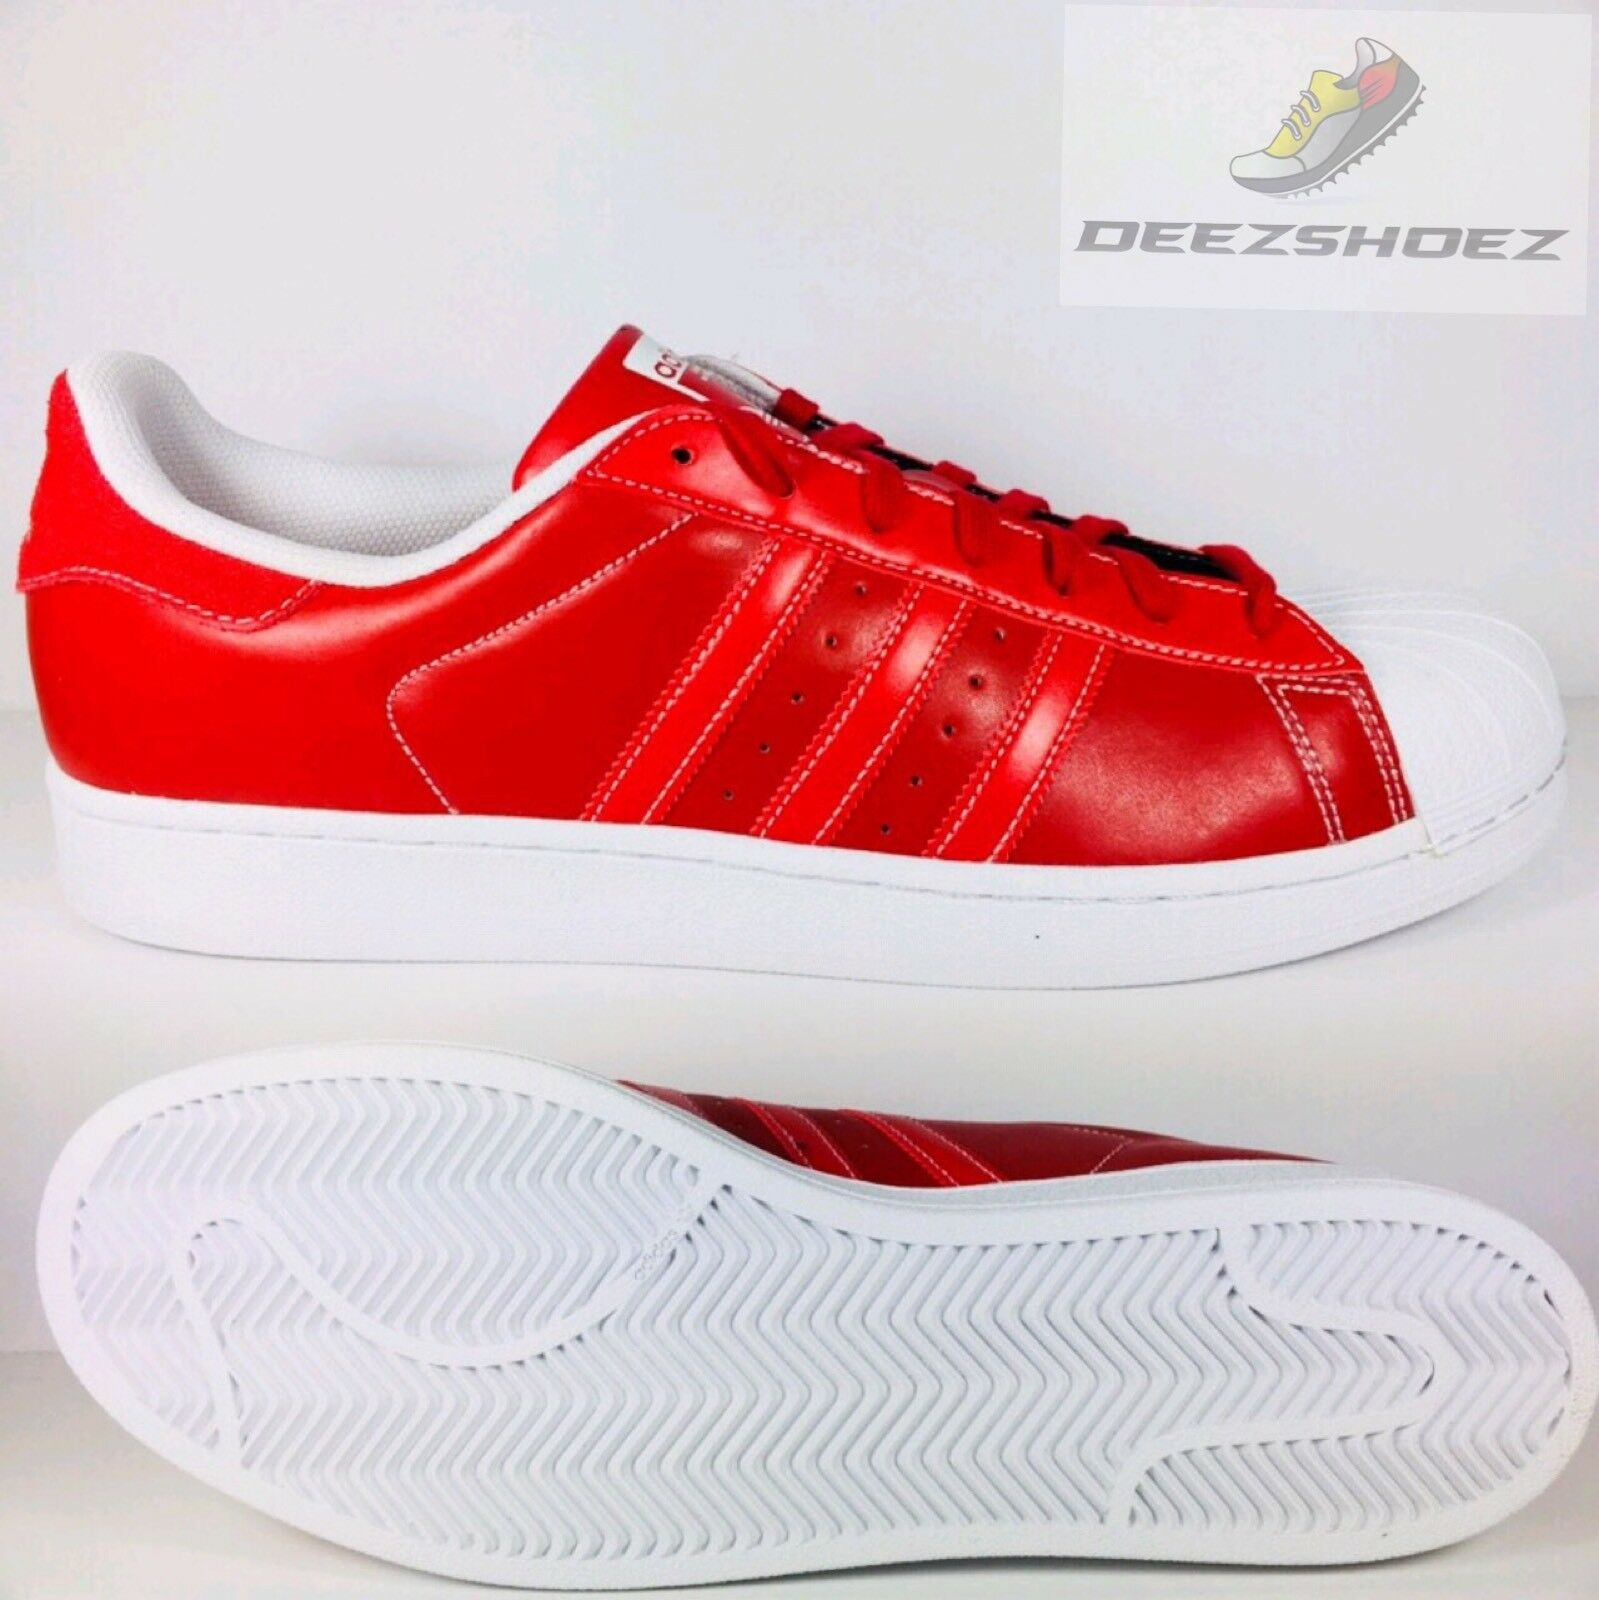 Adidas Orginal Superstar Scarlet Red/White Mens D69299 Us Size 13.5